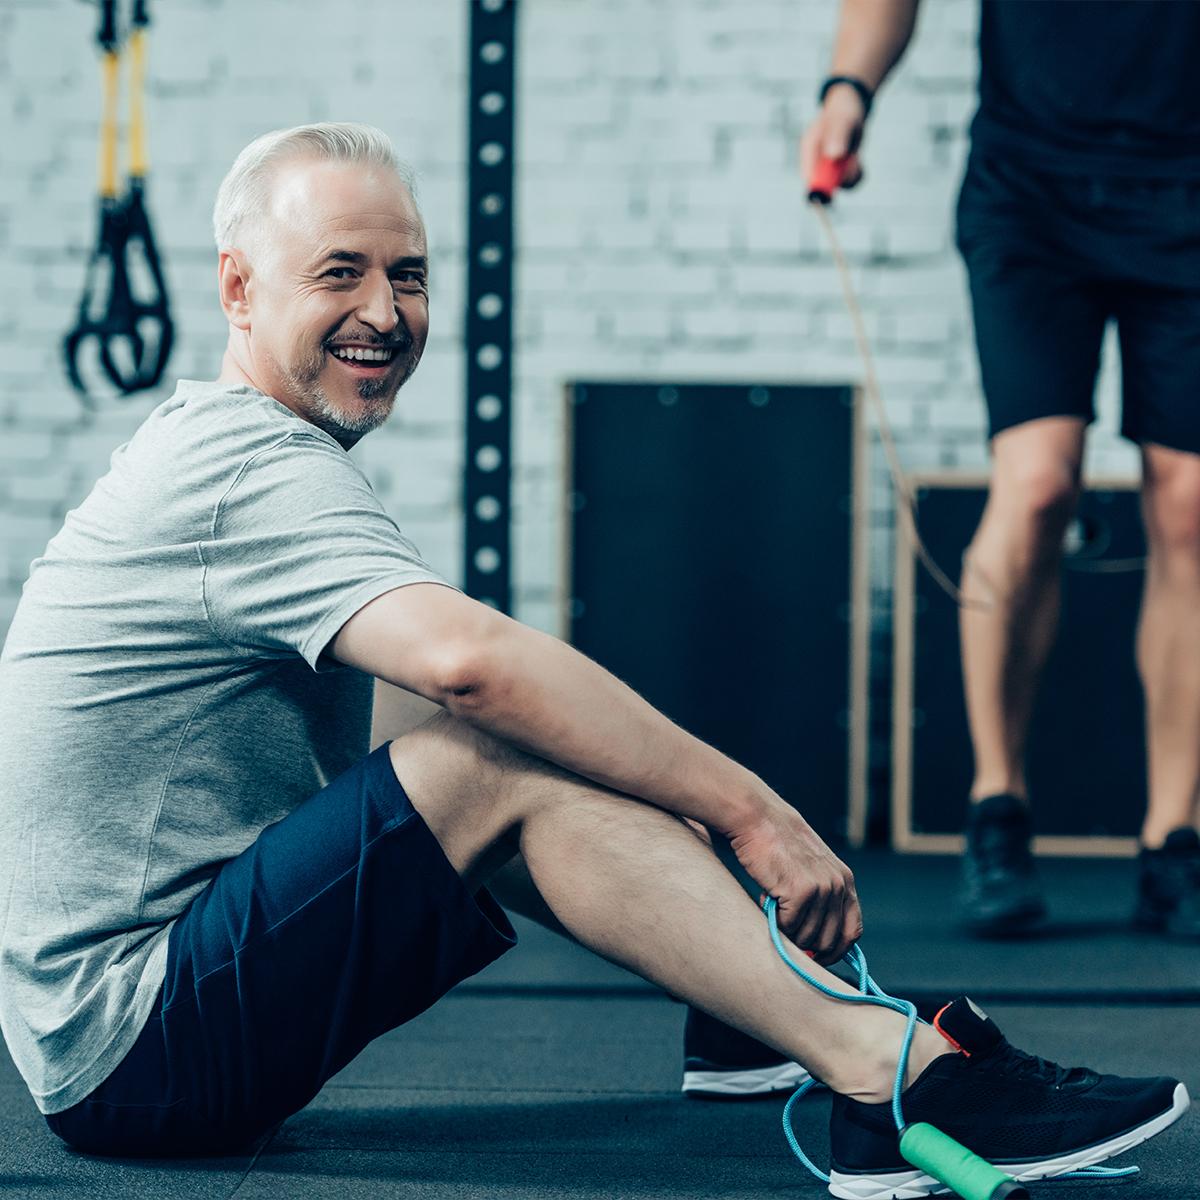 Exercises for orthopedics